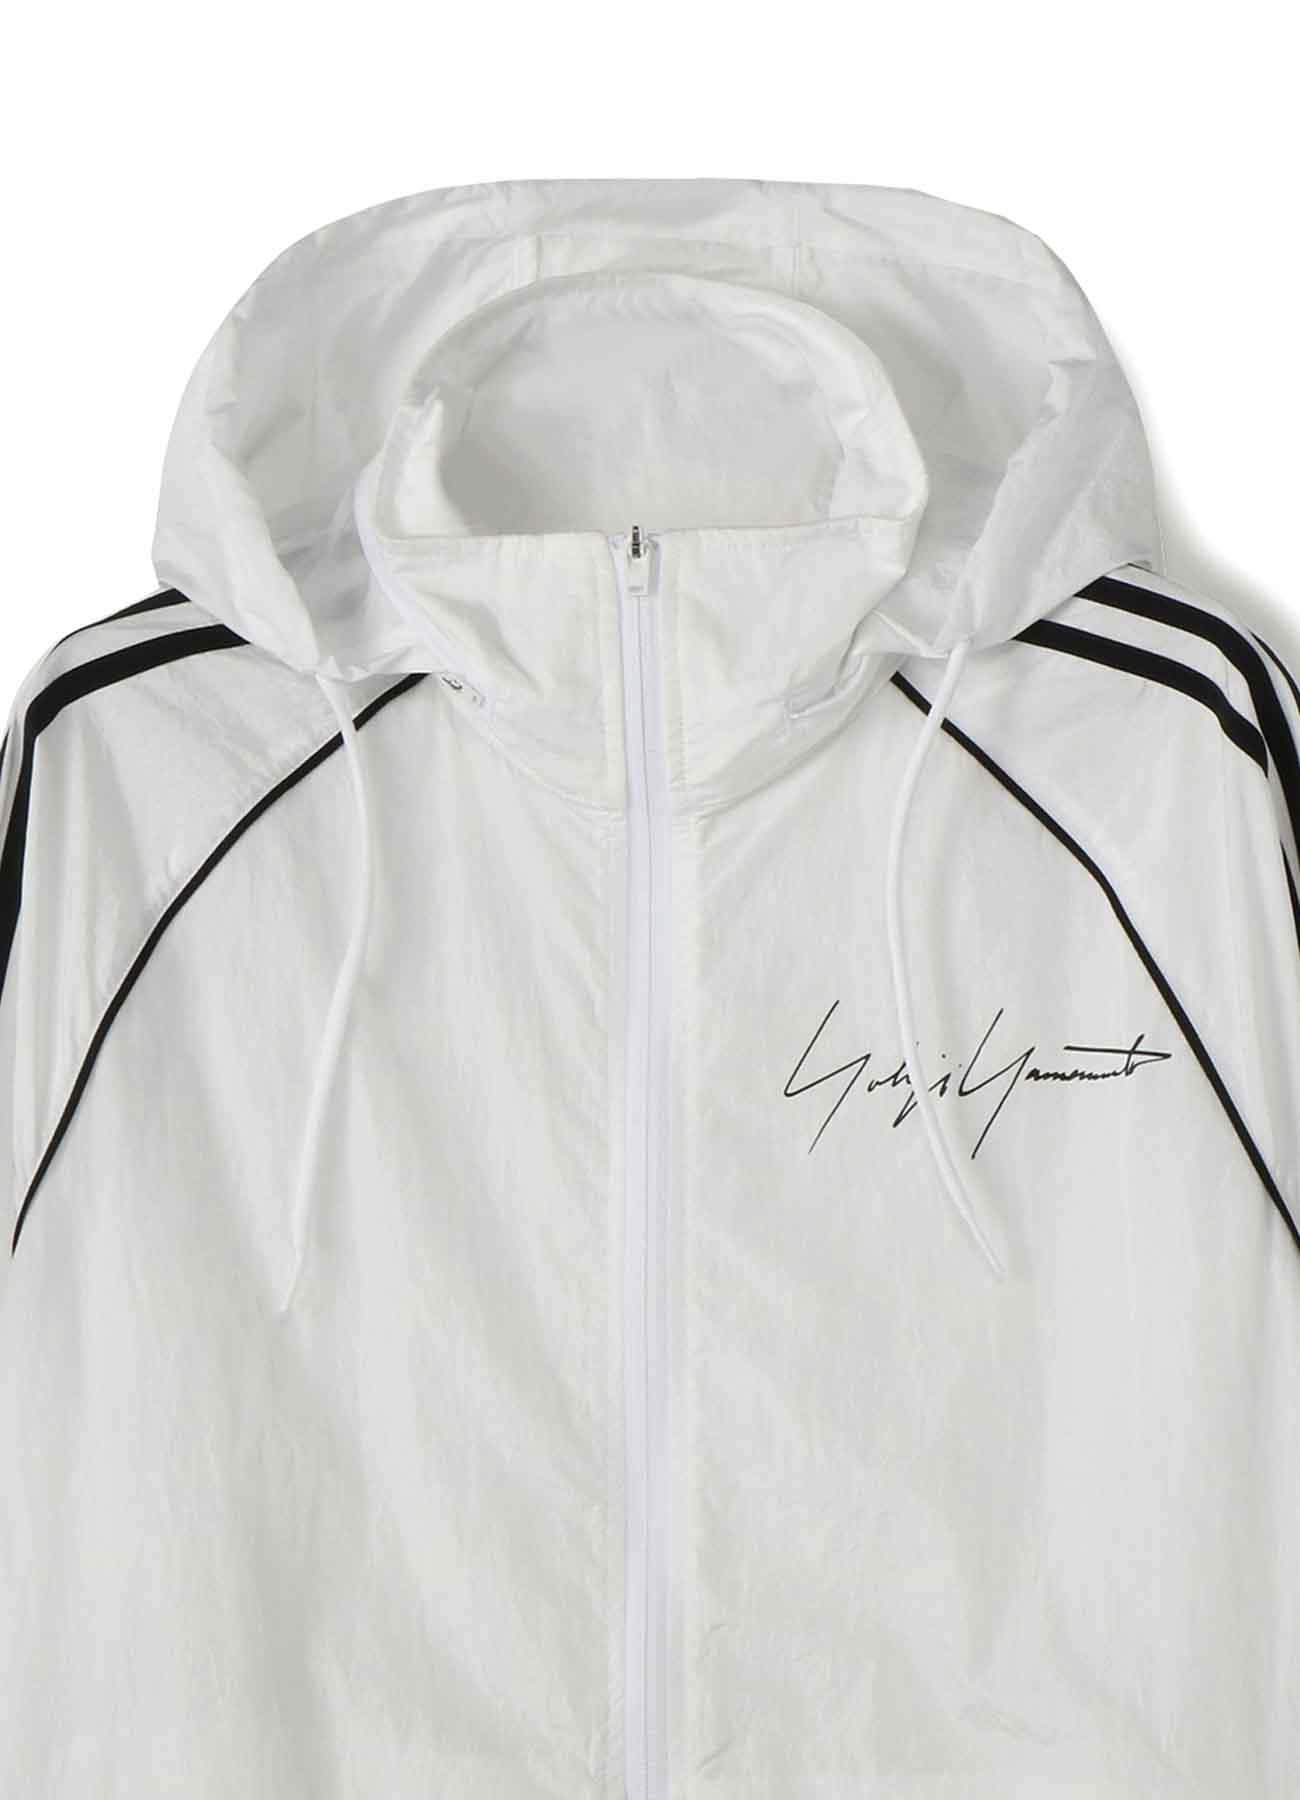 Yohji Yamamoto × adidas YY WINDBREAKER WHITE